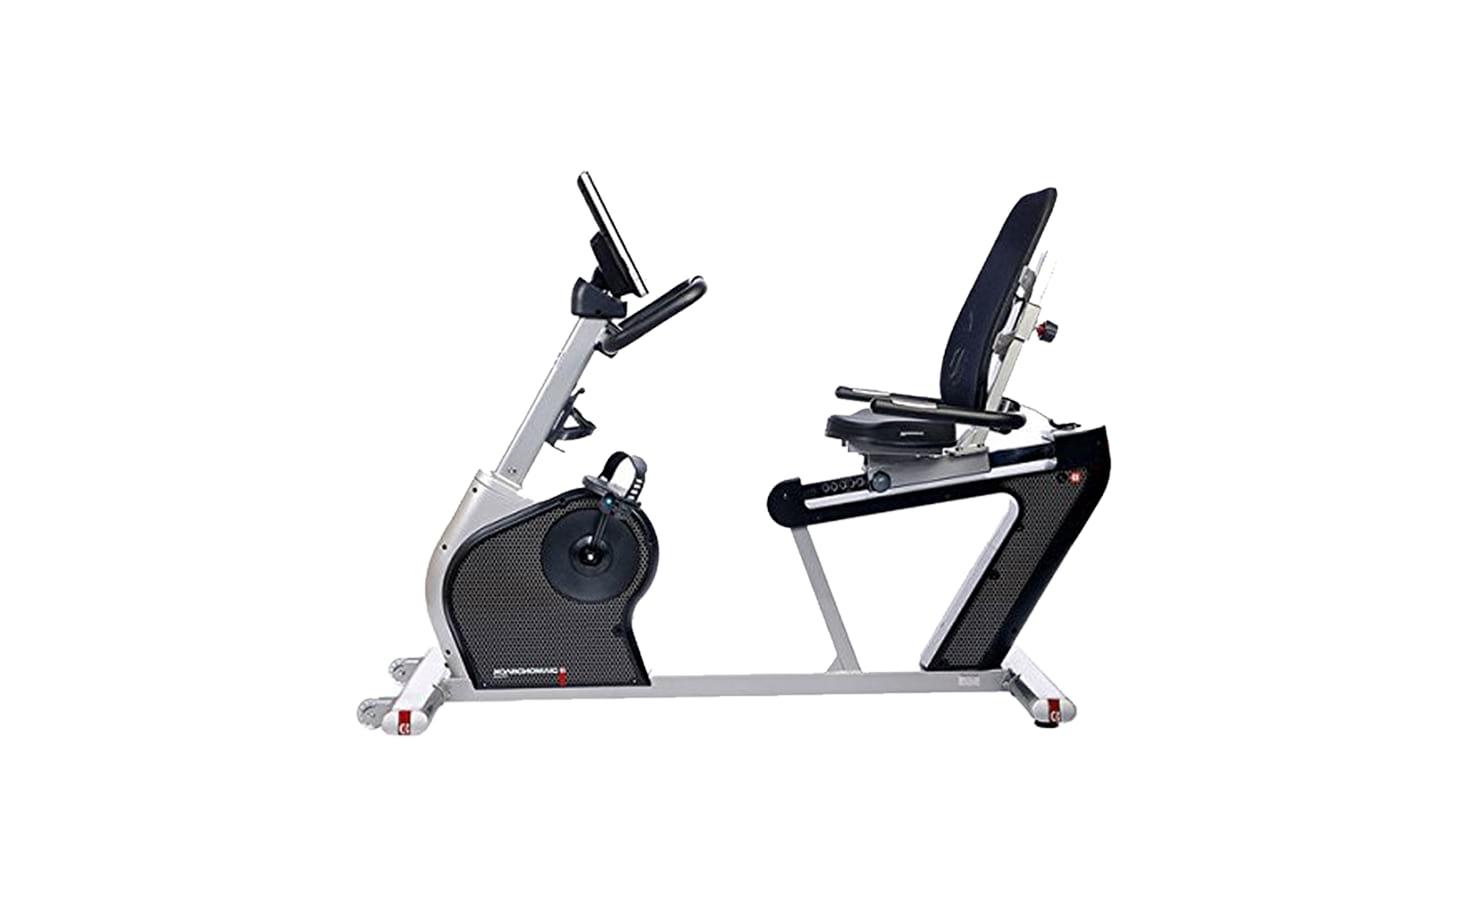 10.-Diamondback-510SR-Fitness-Recumbent-Bike